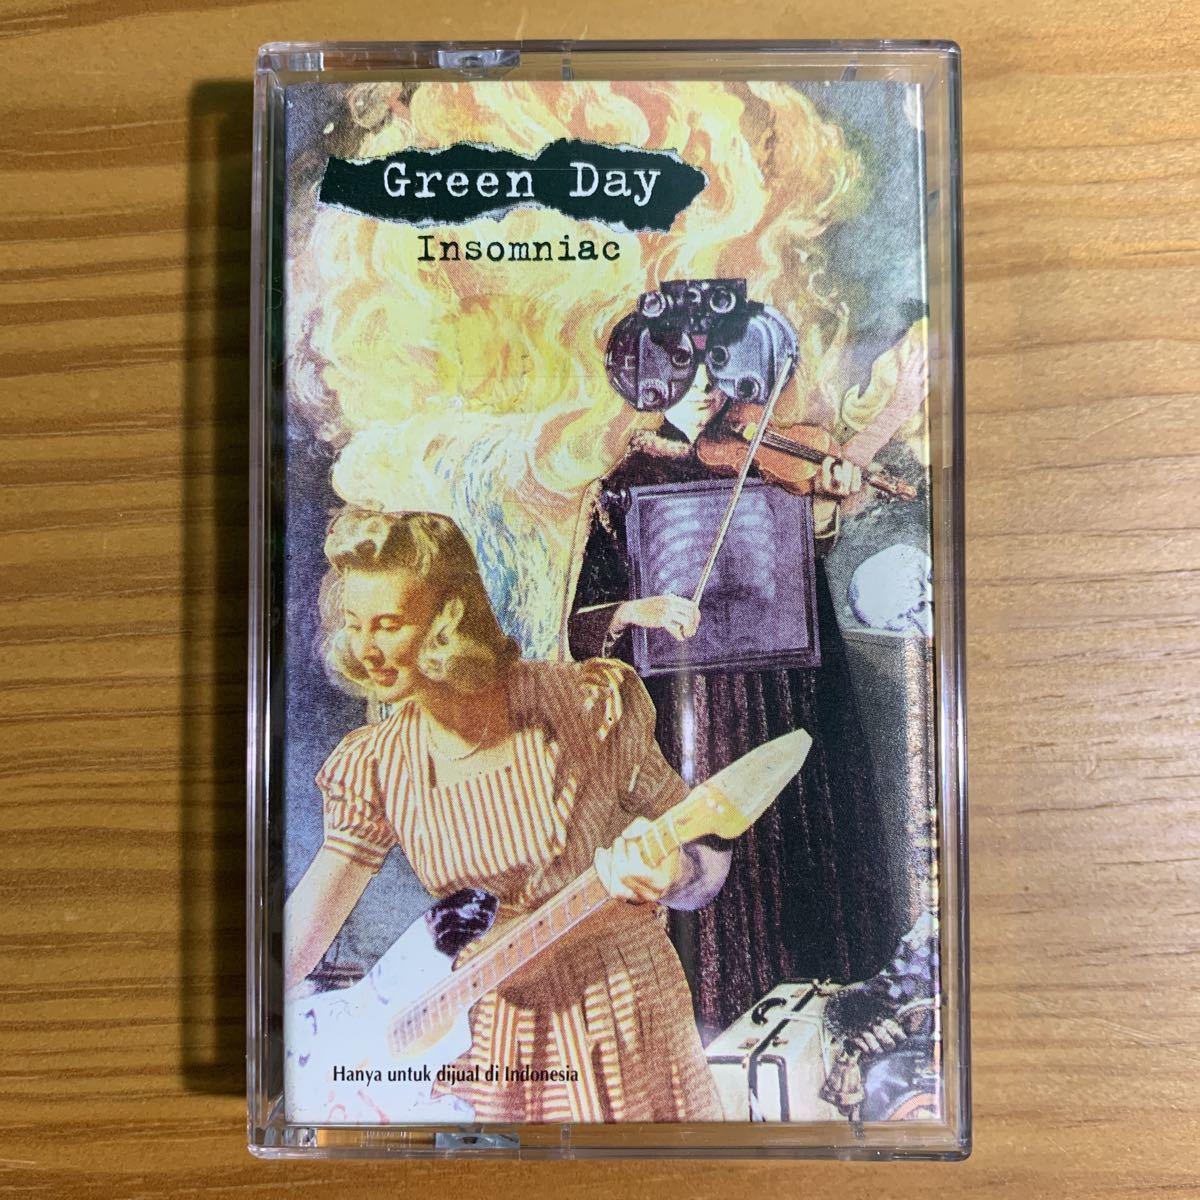 Green Day「Insomniac」カセットテープ 輸入盤 海外限定 入手困難 グリーンデイ Winston Smith コラージュ 90's レコード 名盤 RARE!!_画像1